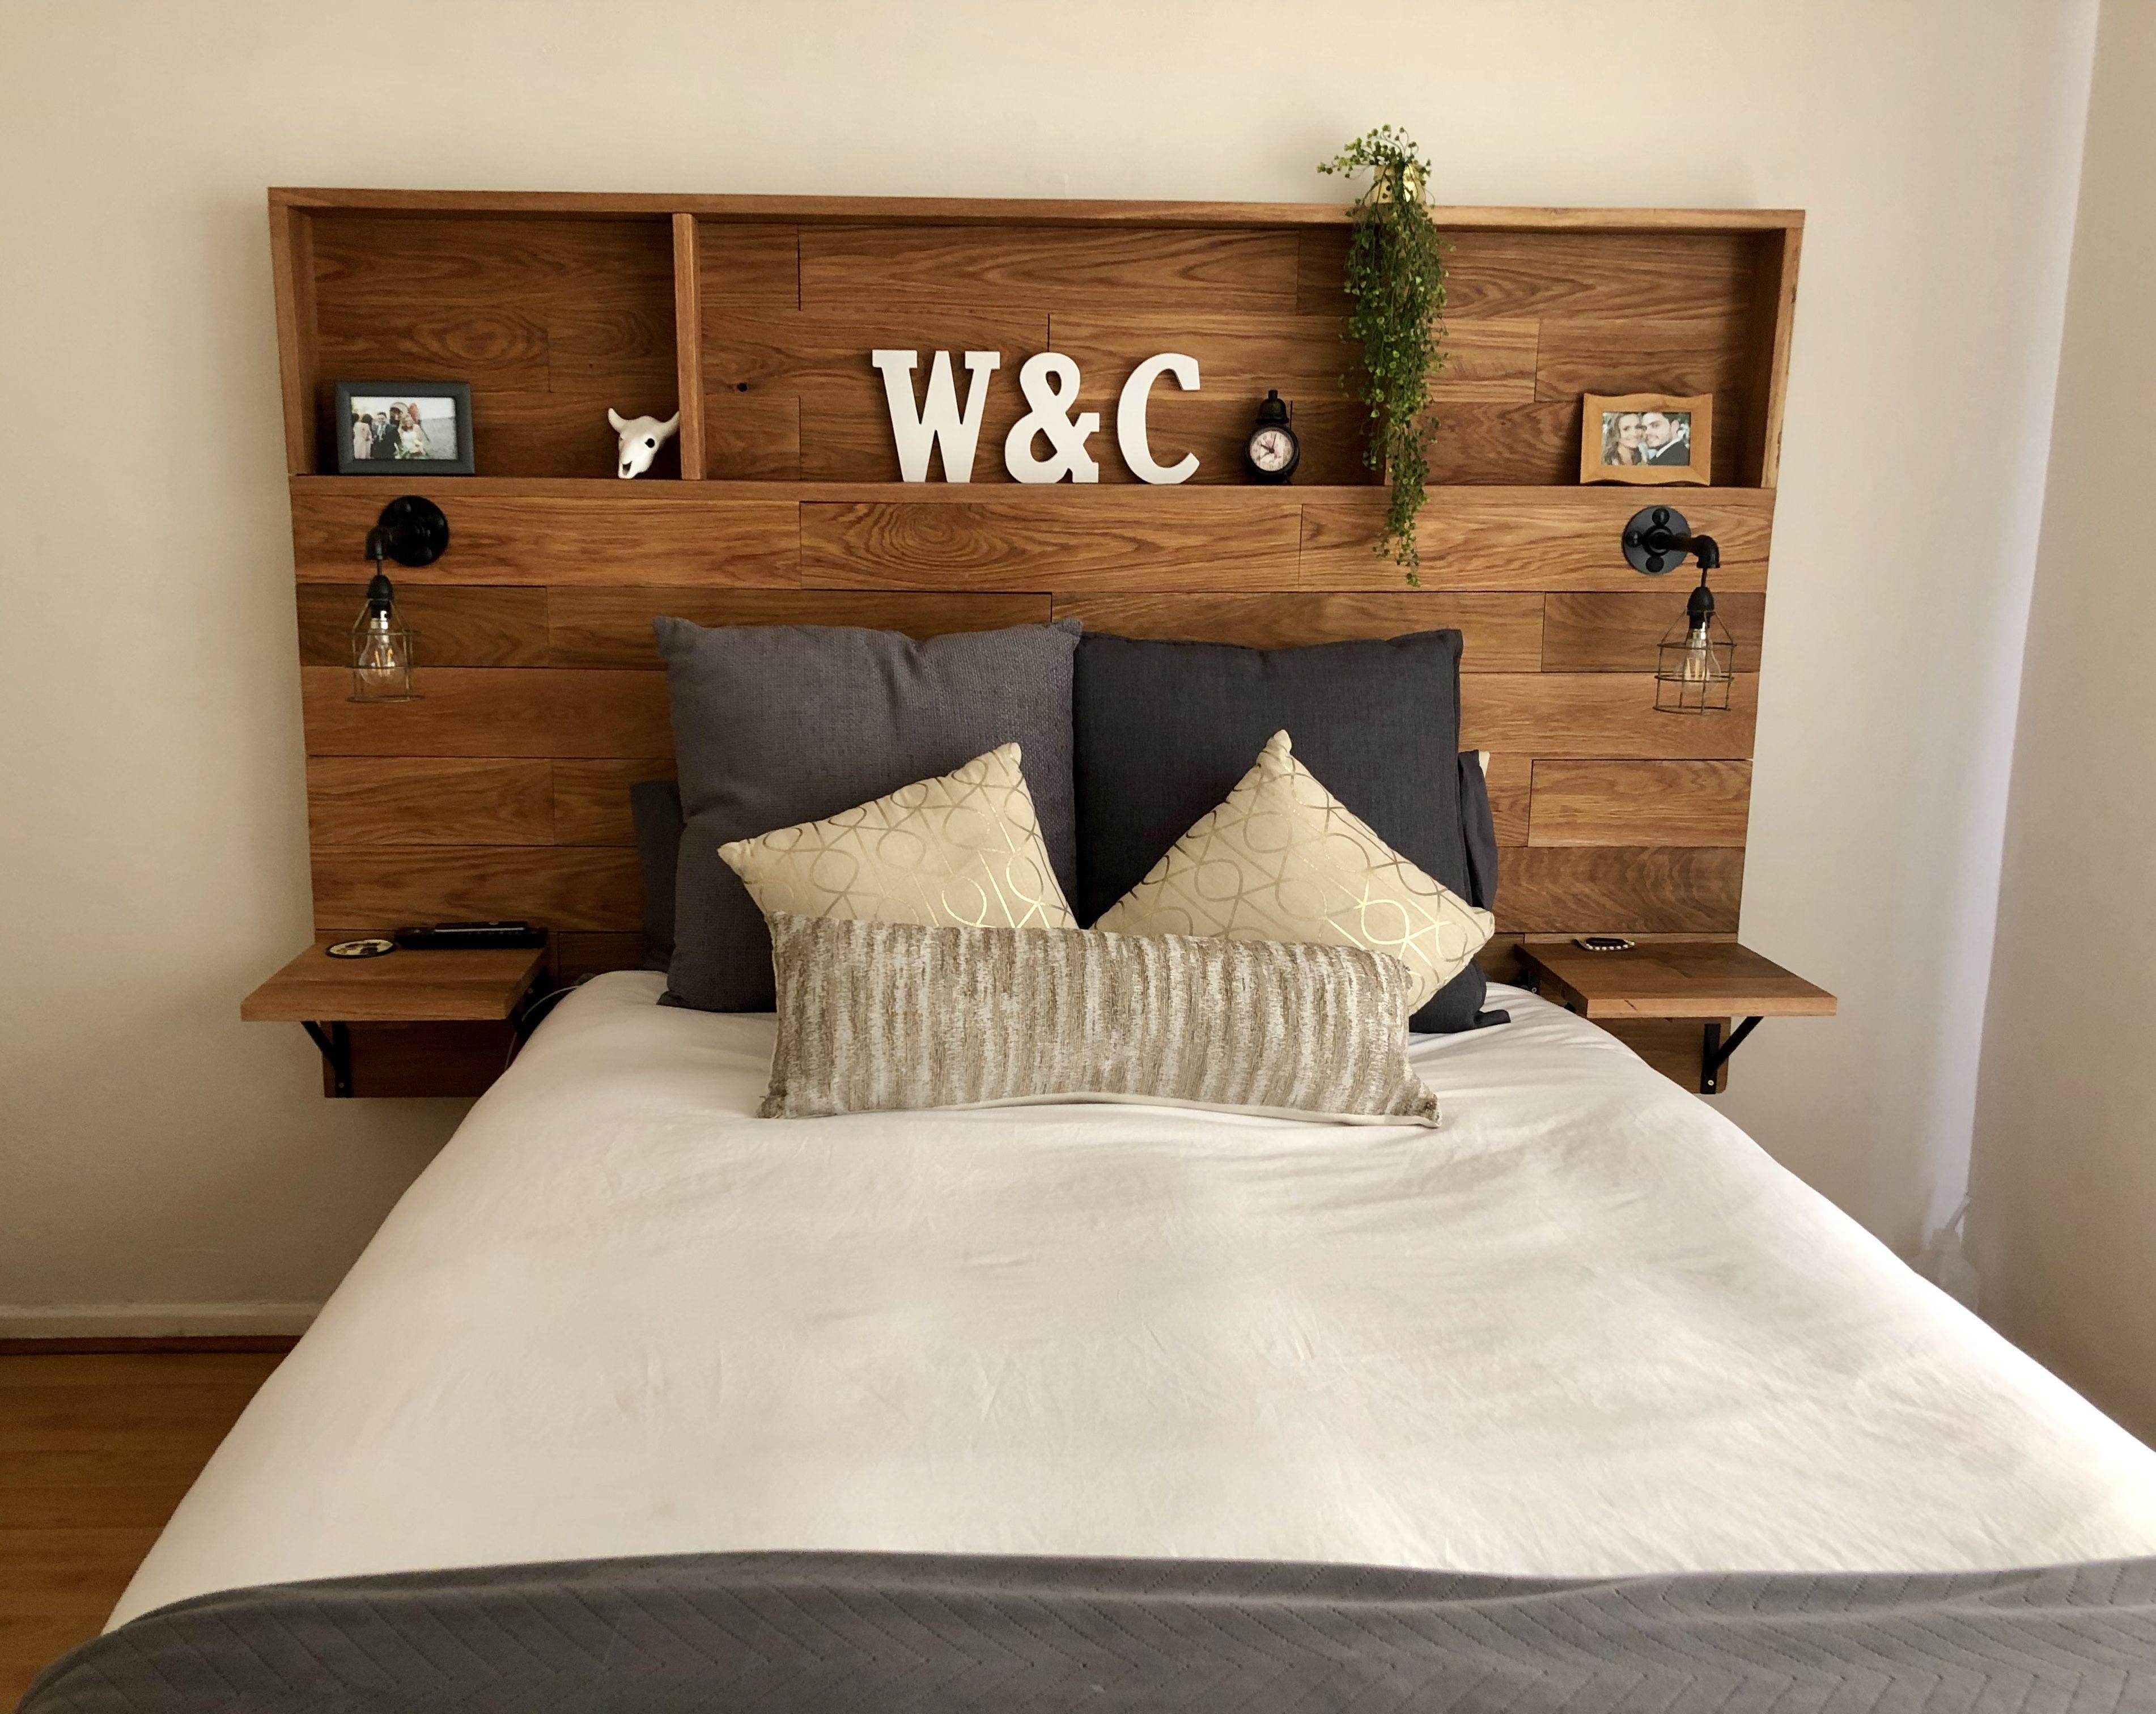 Diy Wooden Headboard With Shelves Diy Wood Headboard Headboard With Shelves Bedroom Headboard